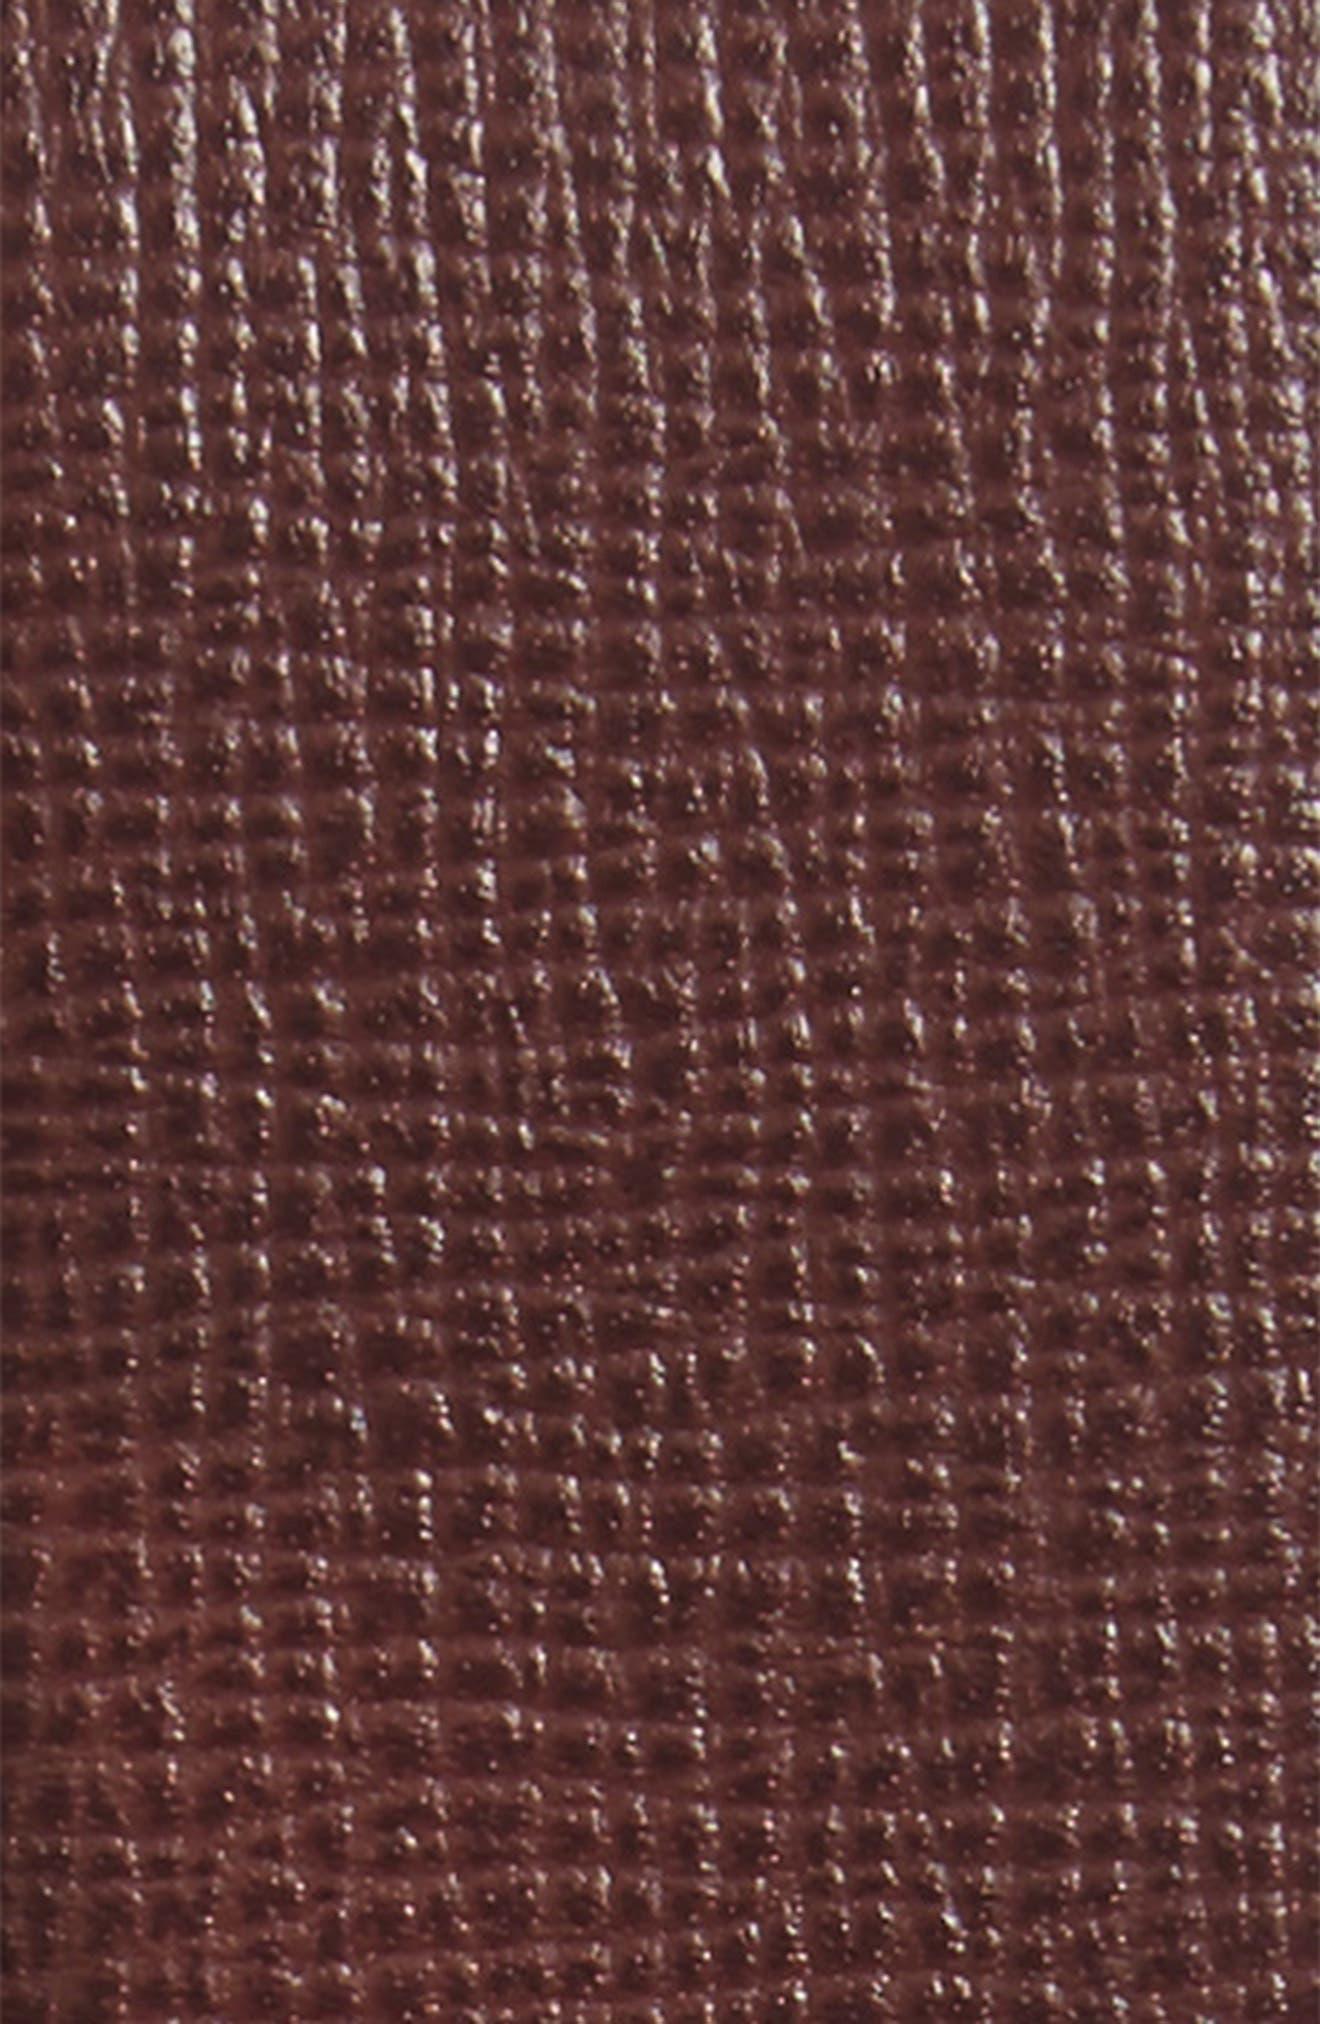 Dean Leather Belt,                             Alternate thumbnail 2, color,                             Burgundy Red